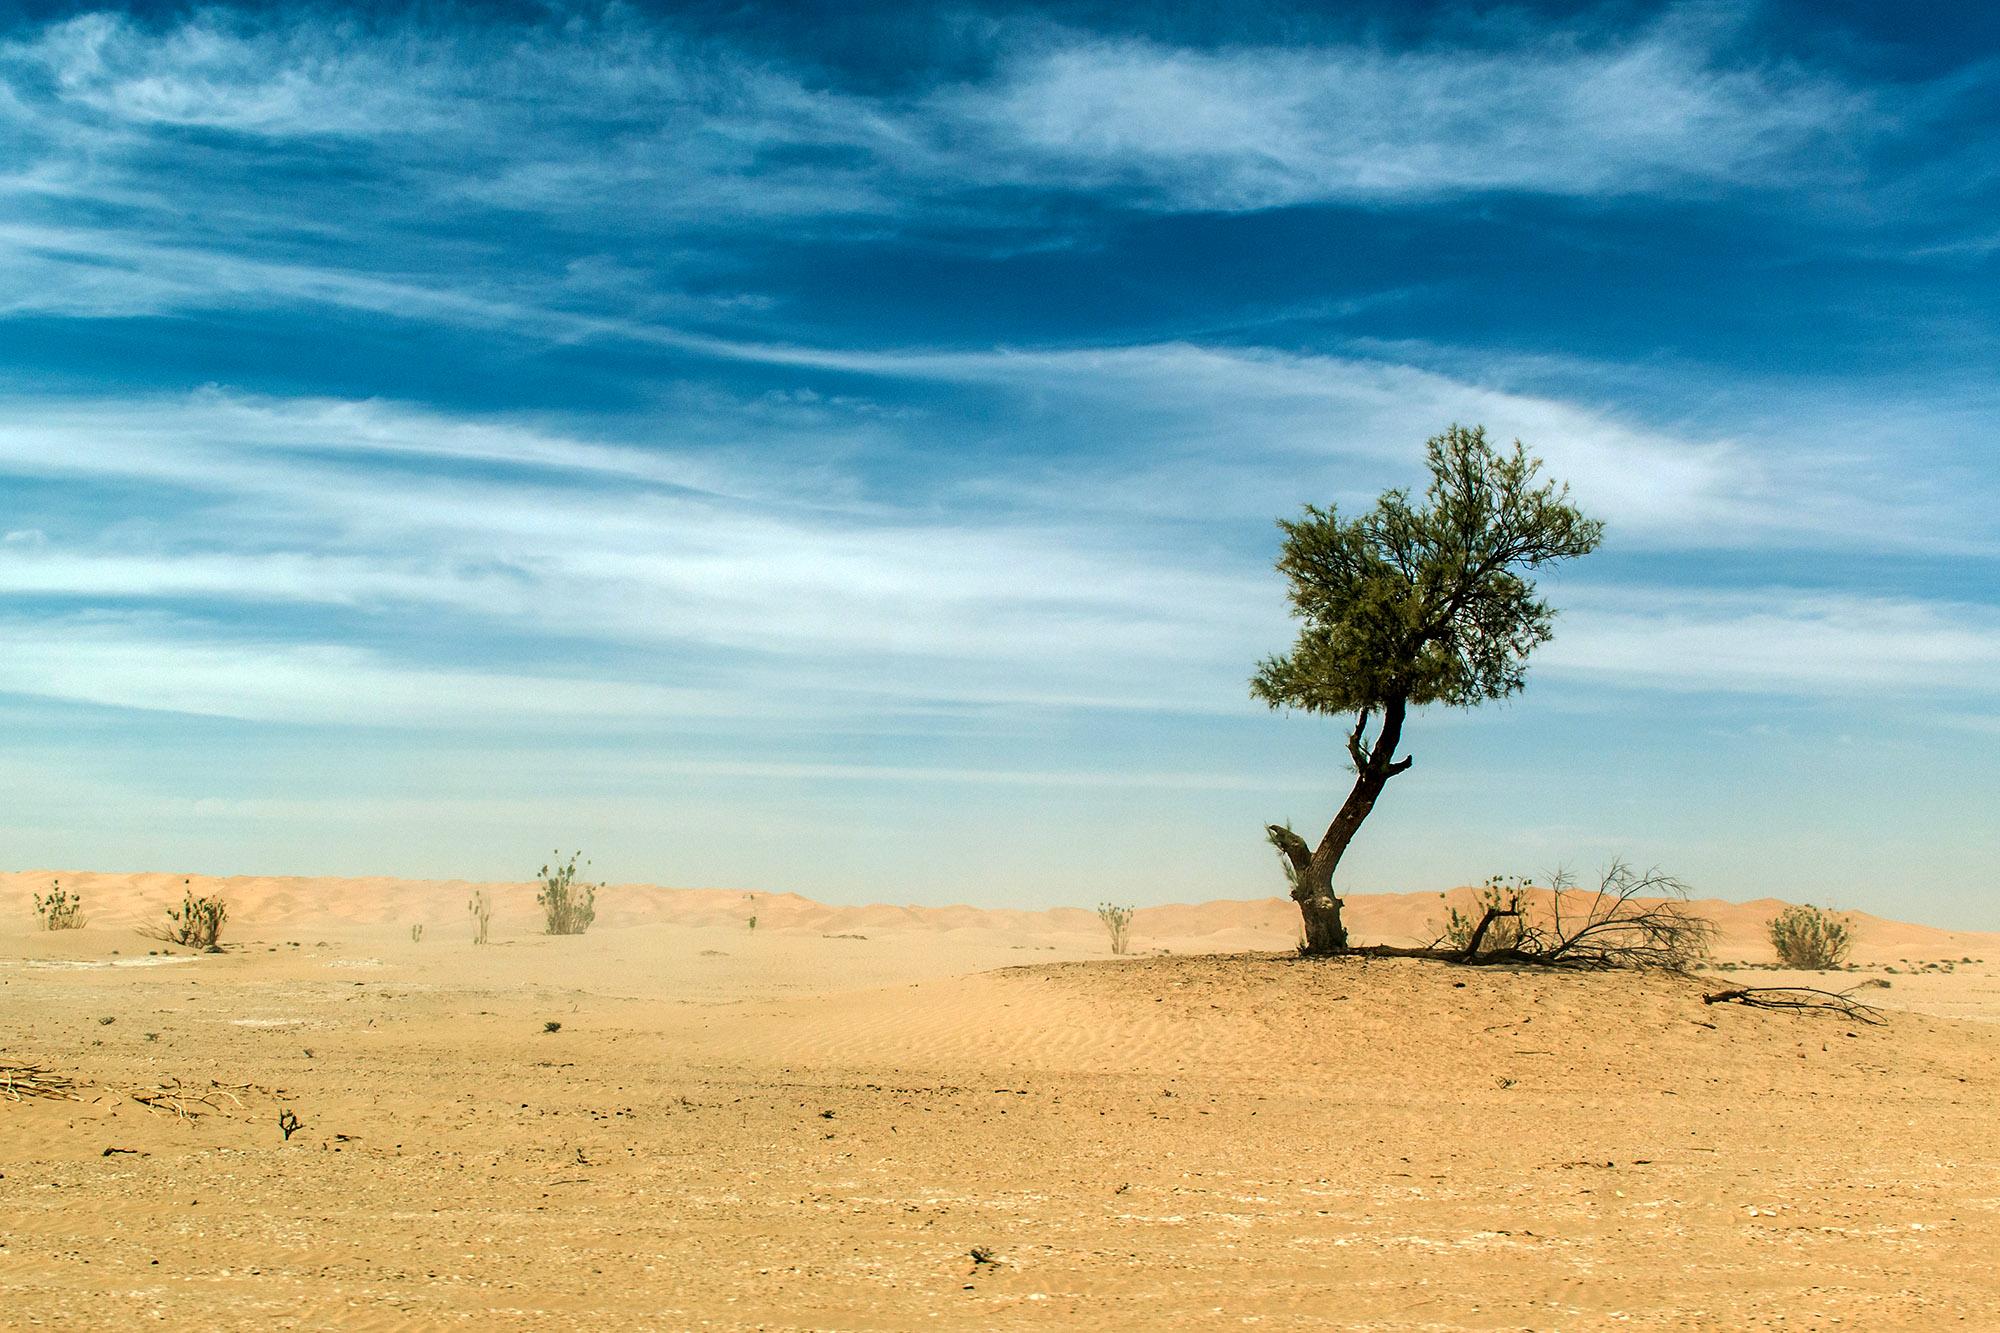 outdoor dry sand tree standing dune in oman sky old biggest desert rub al khali